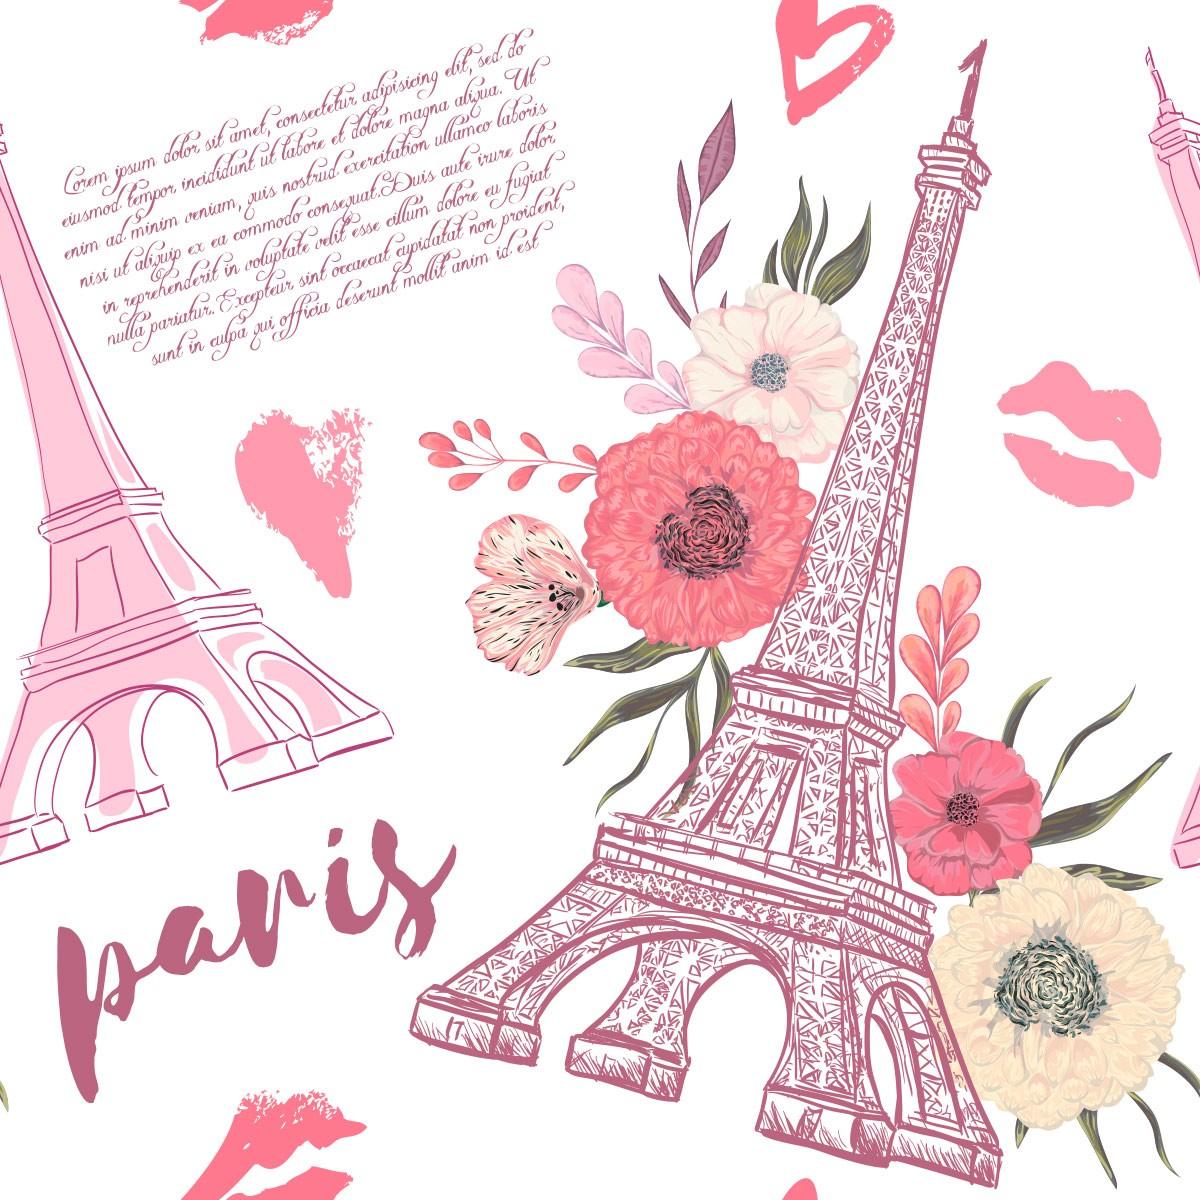 Papel de Parede Paris Torre Eiffel Love Beijo Floral Adesivo